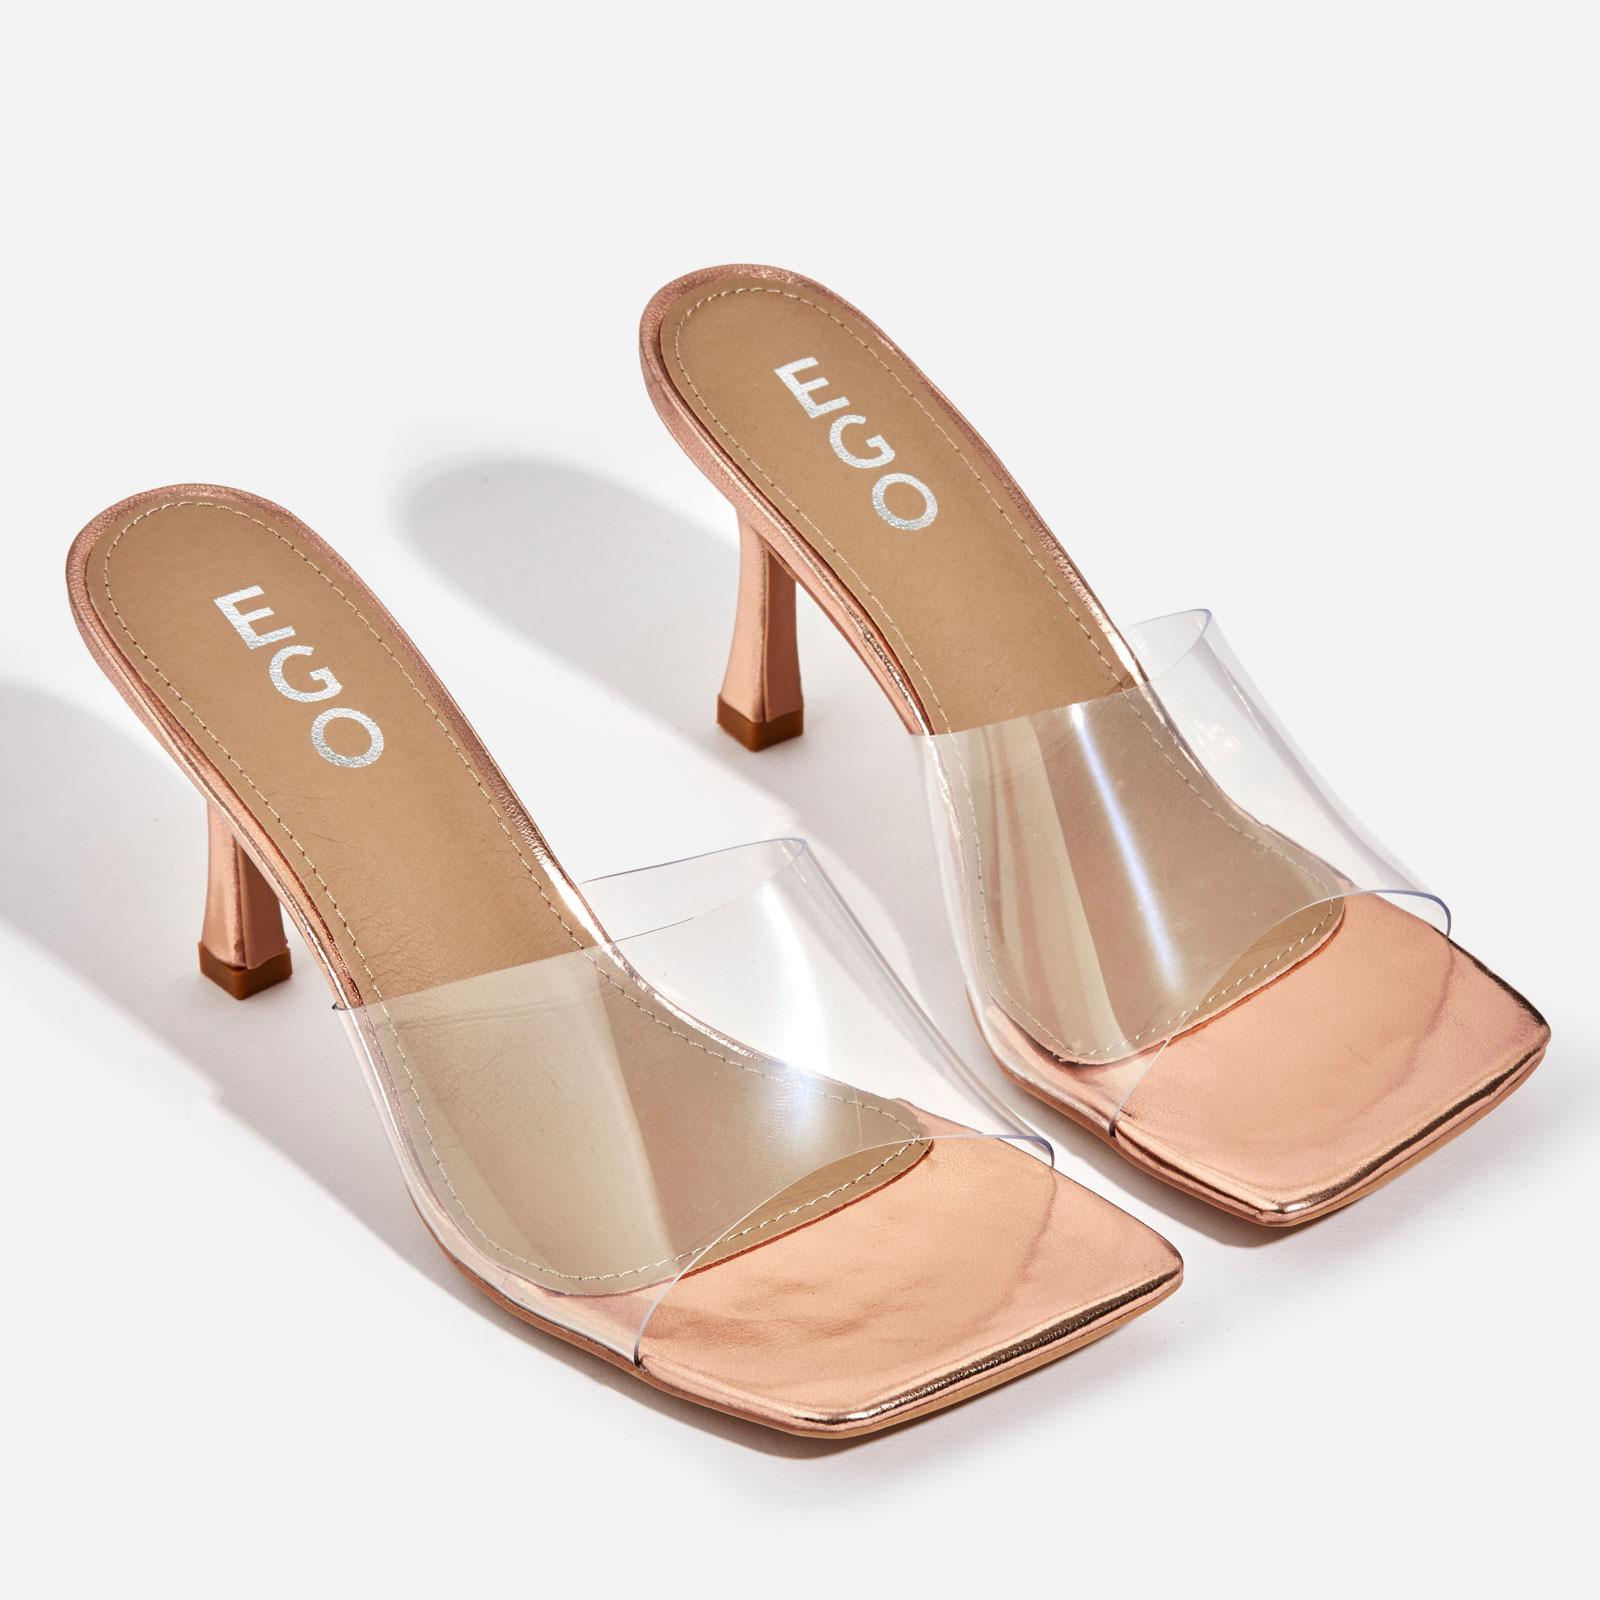 Hilton Square Peep Toe Perspex Kitten Heel Mule In Rose Gold Patent